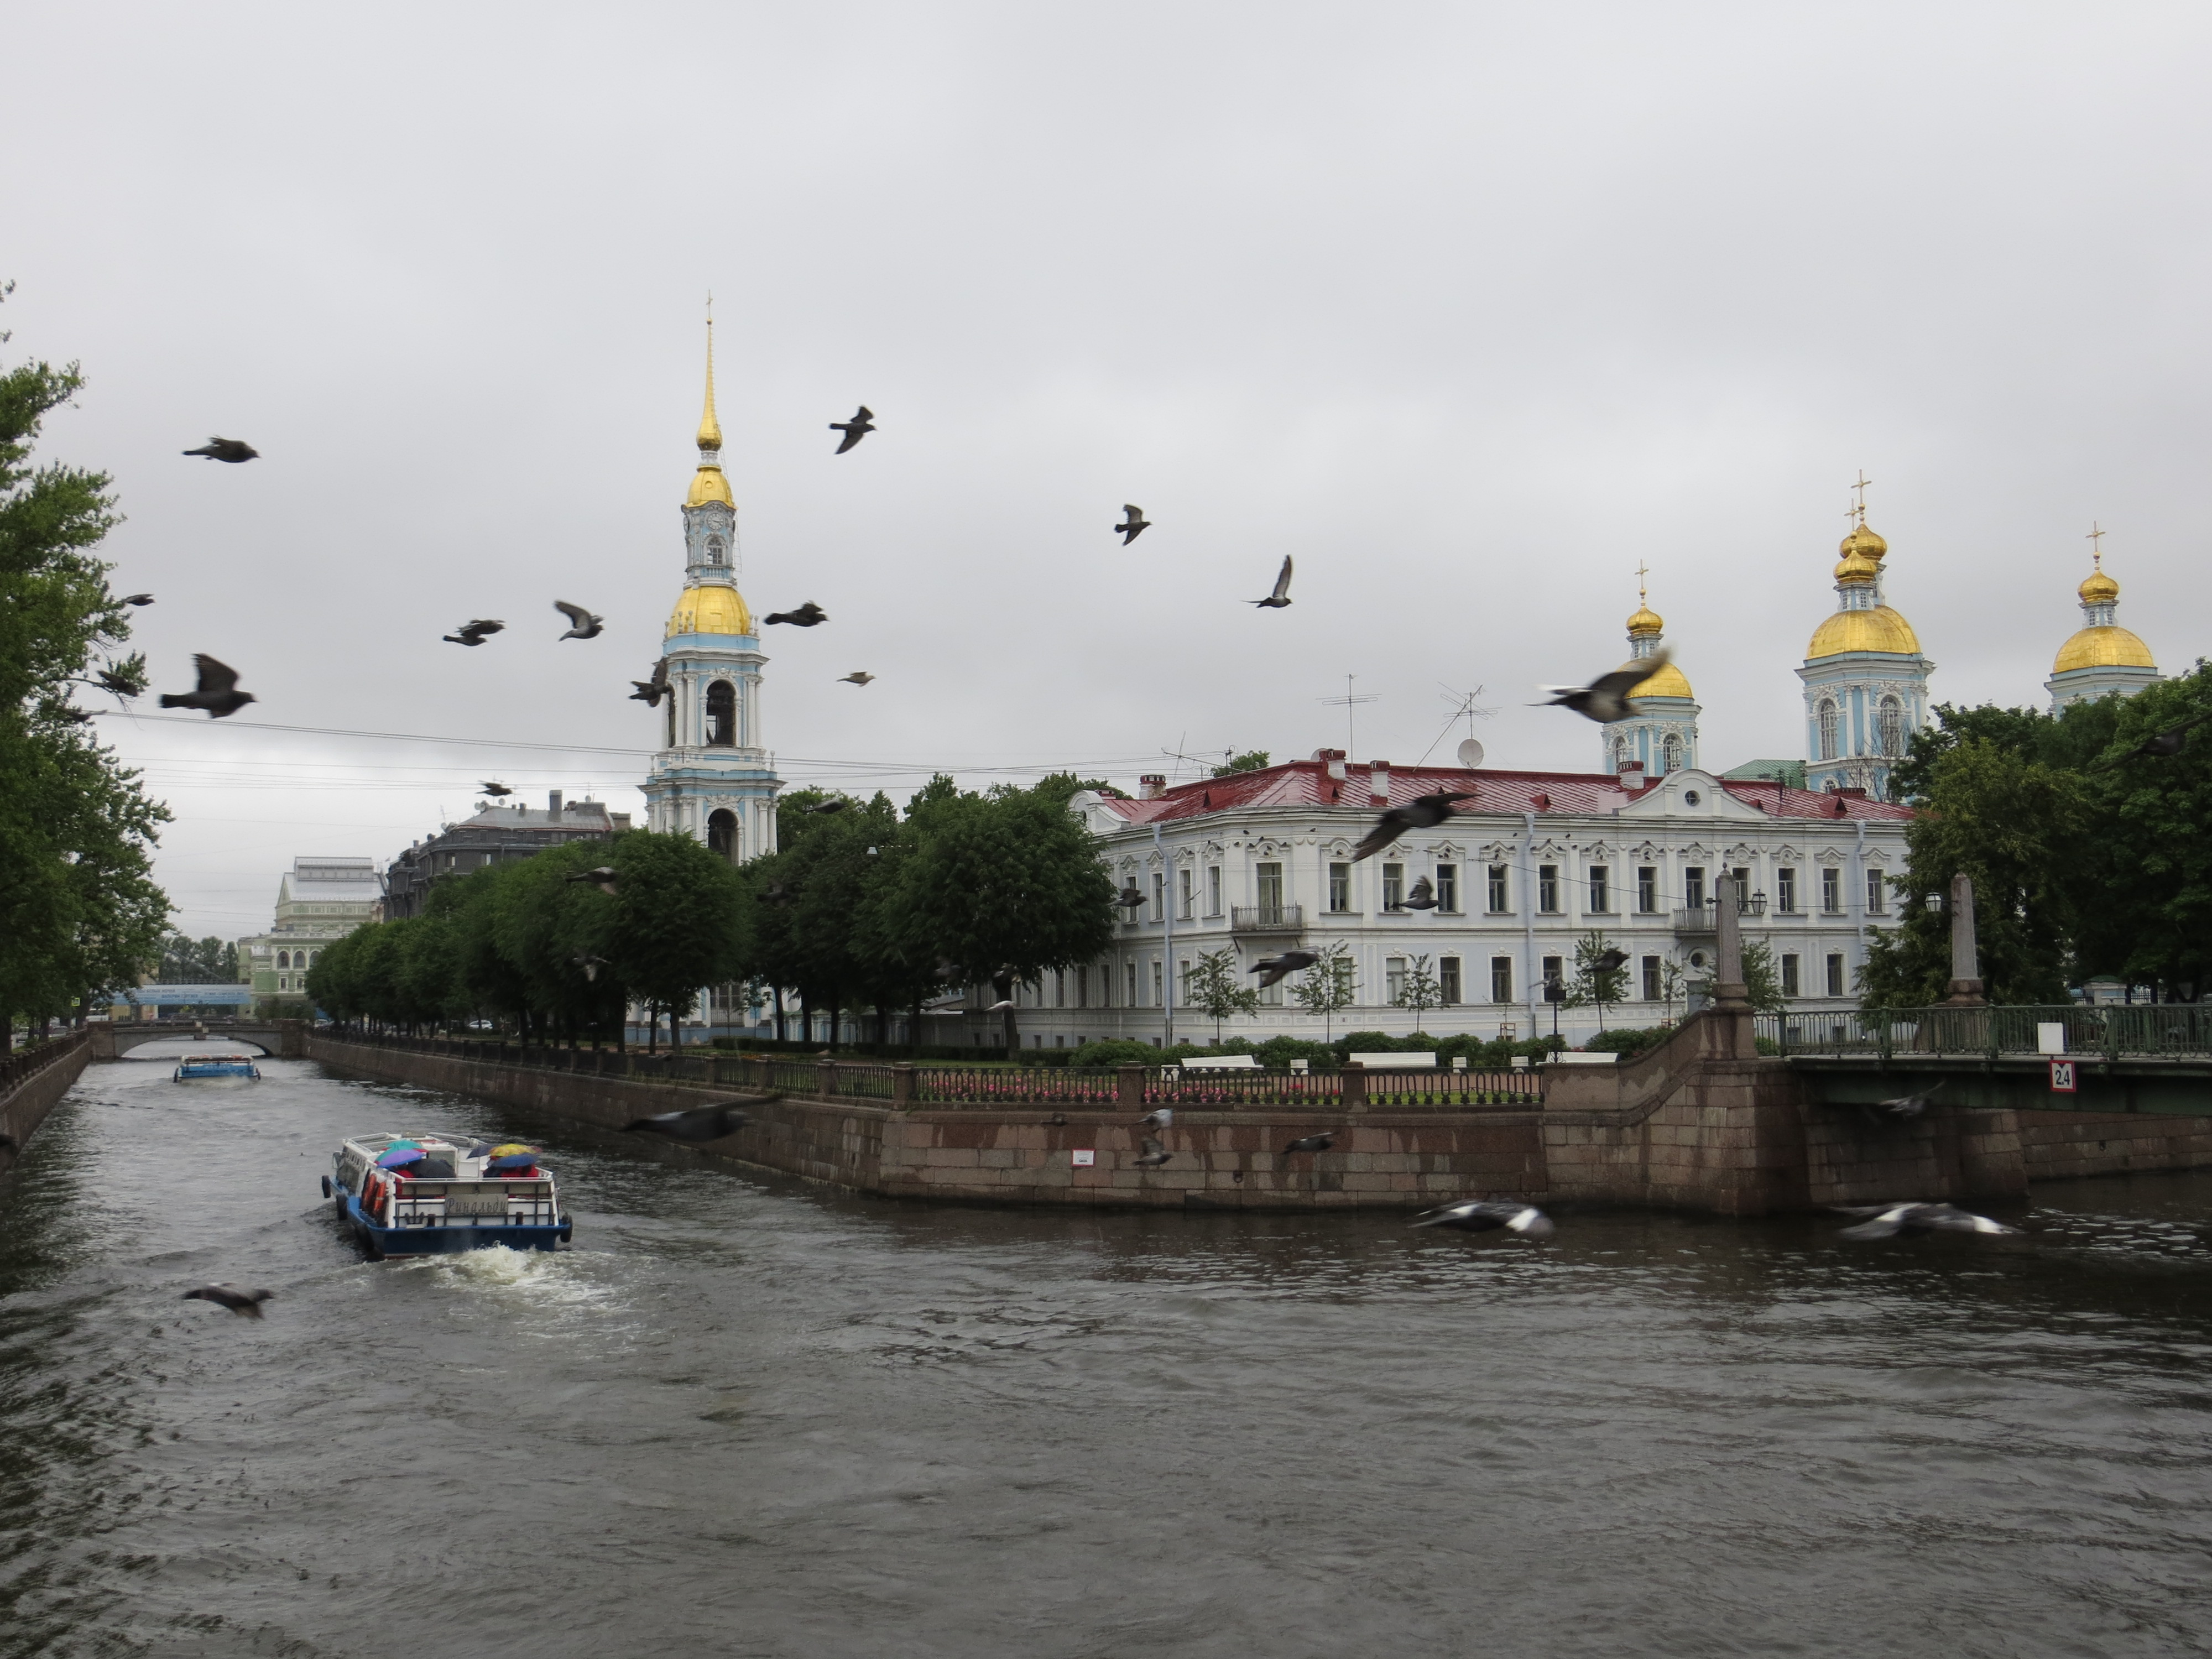 St. Petersburg Russia water view